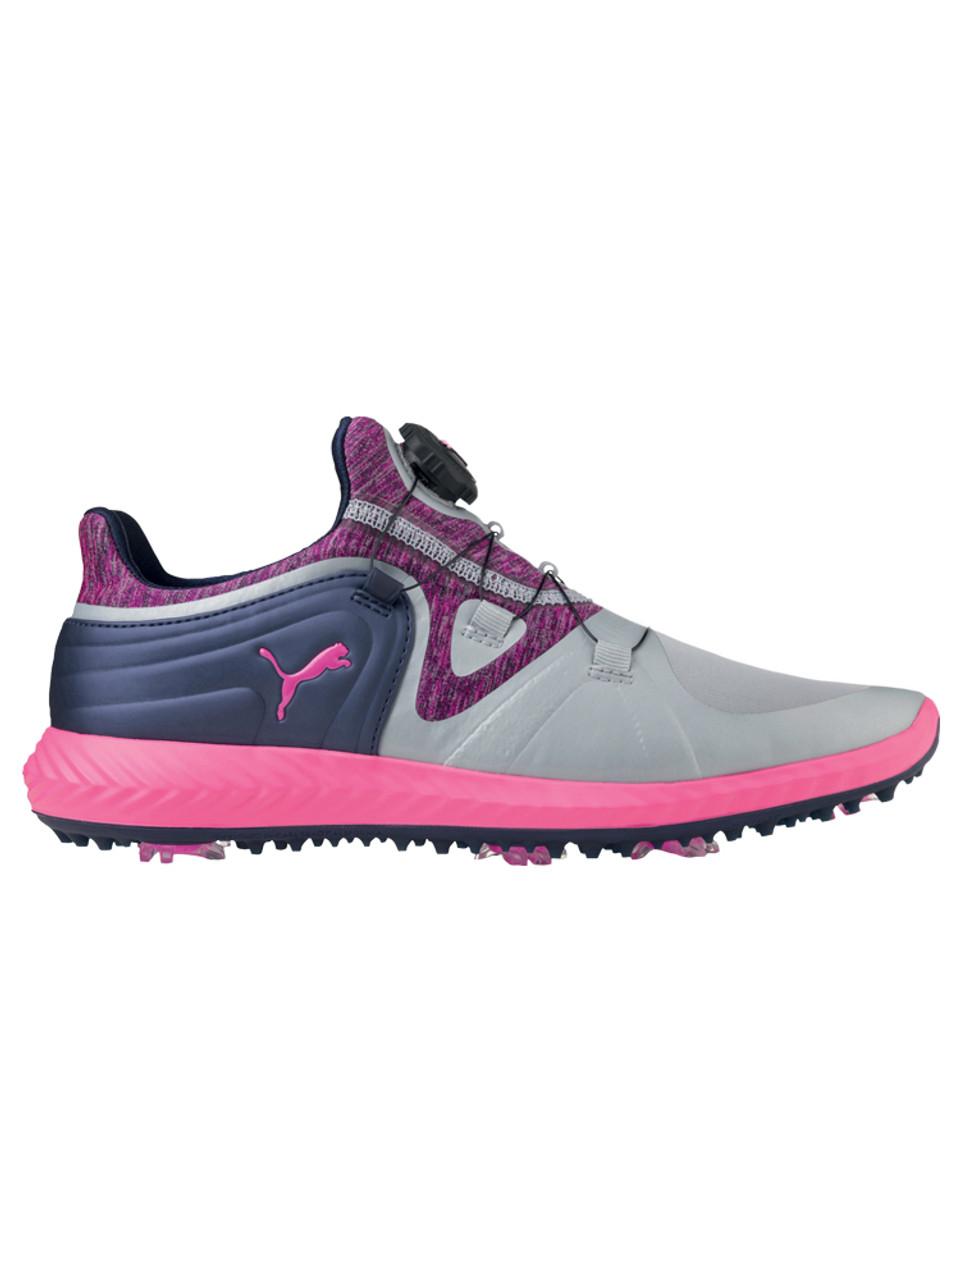 Puma W Ignite Blaze Sport DISC Shoes QuarryKnockout Pink